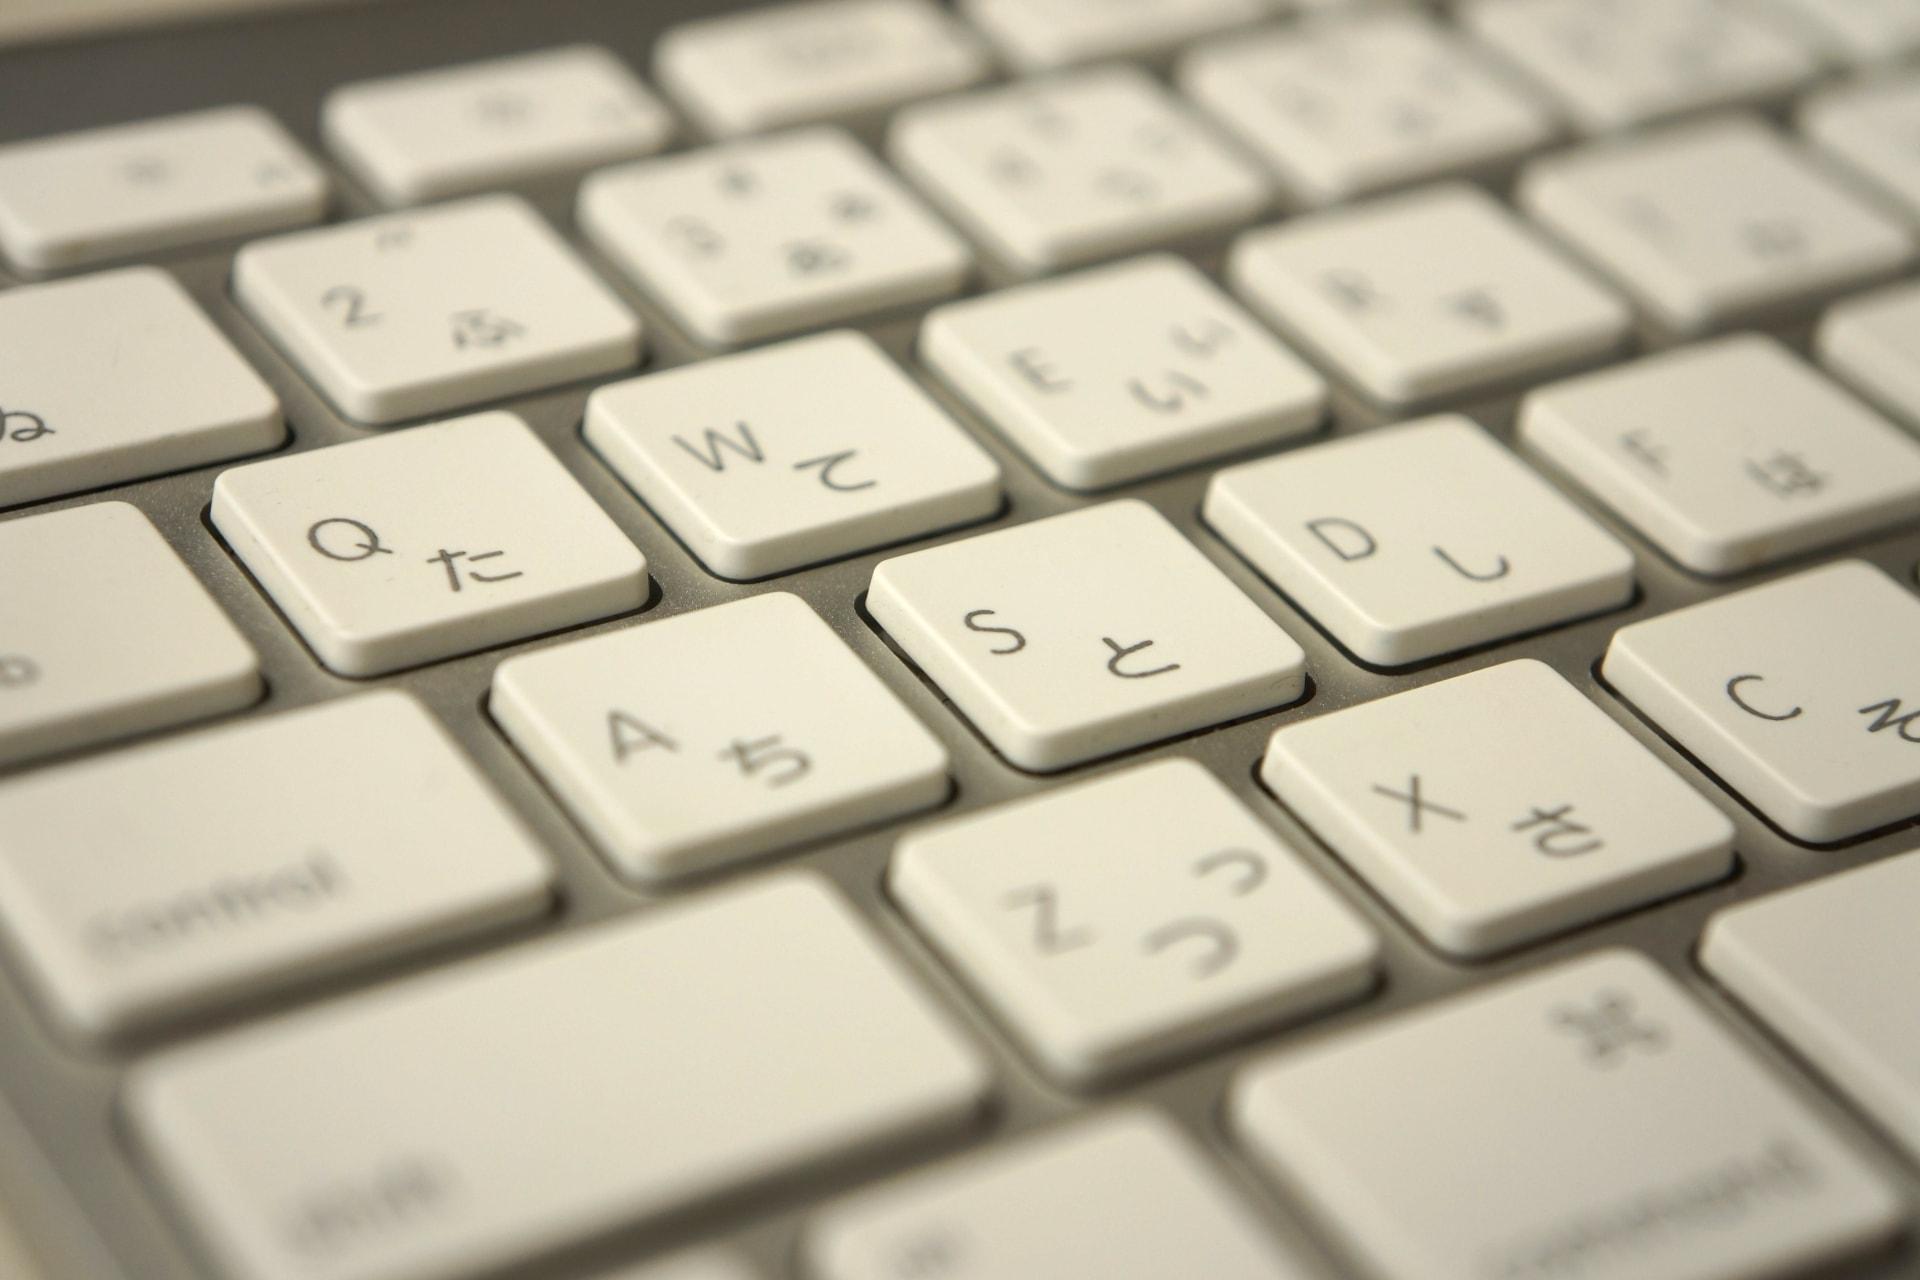 URLにキーワードを含めるのはSEO的に有利?